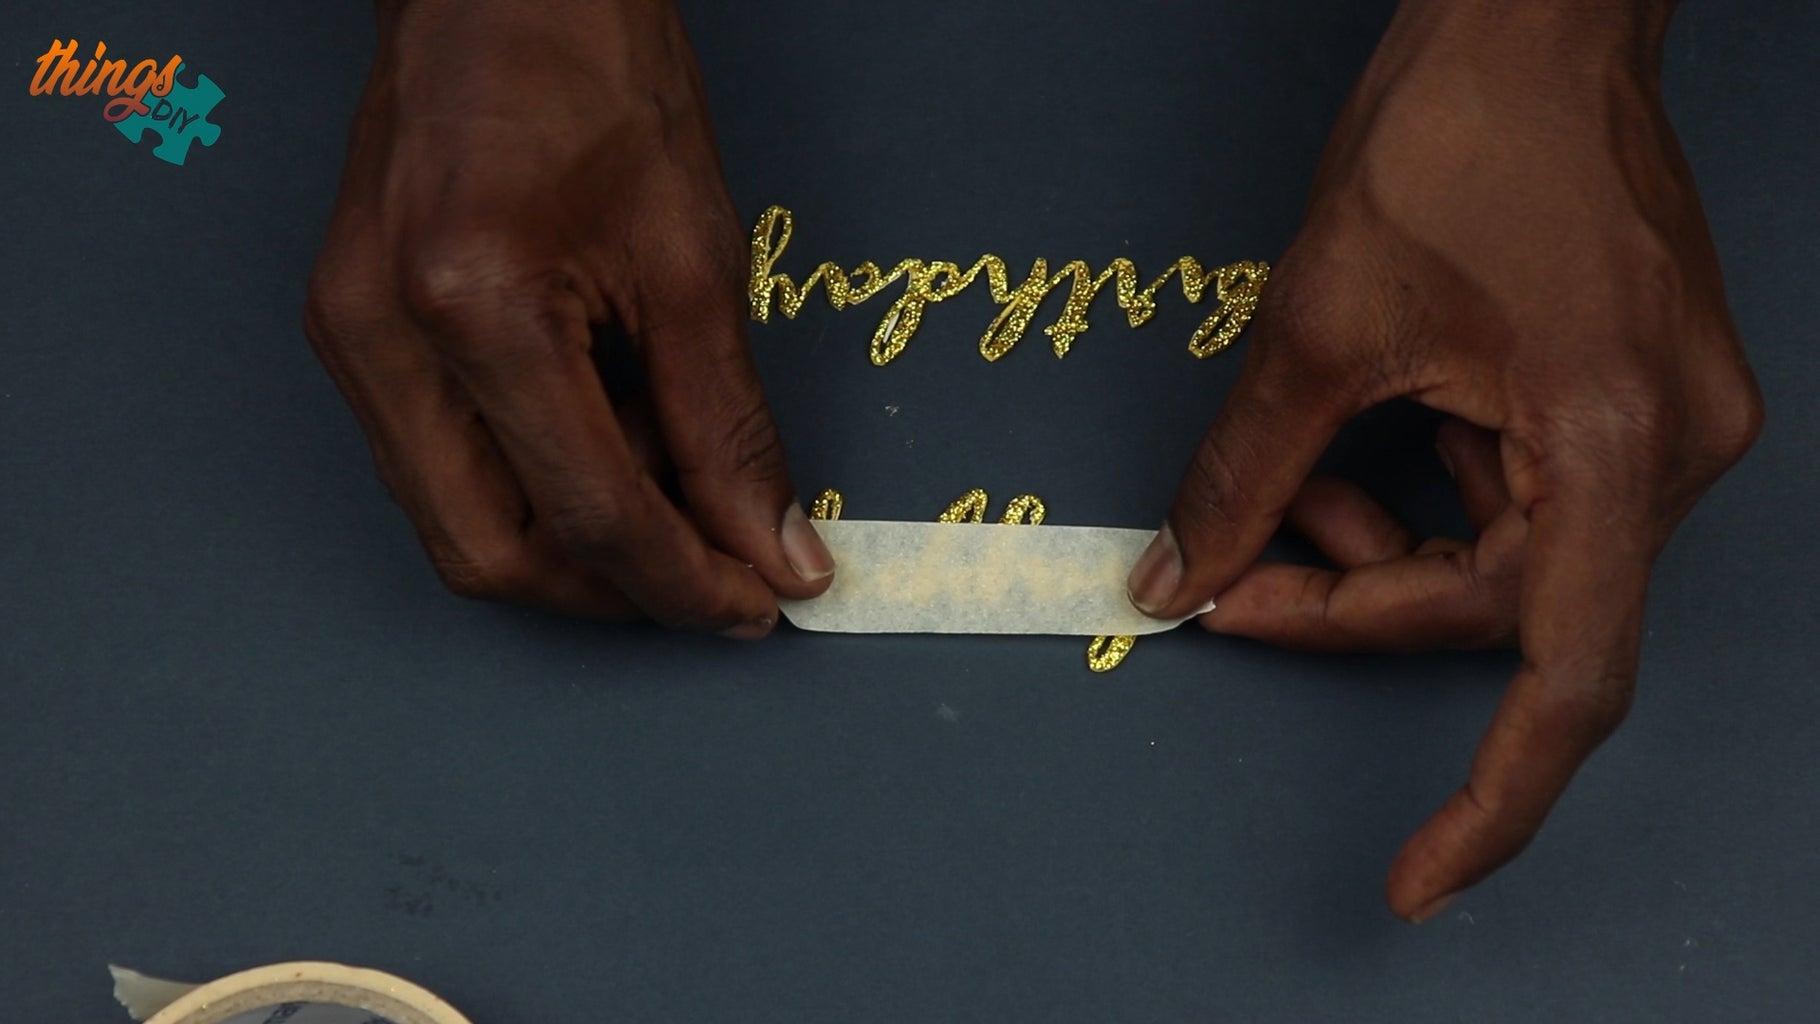 Paste 'Happy Birthday' Cutout Onto Card